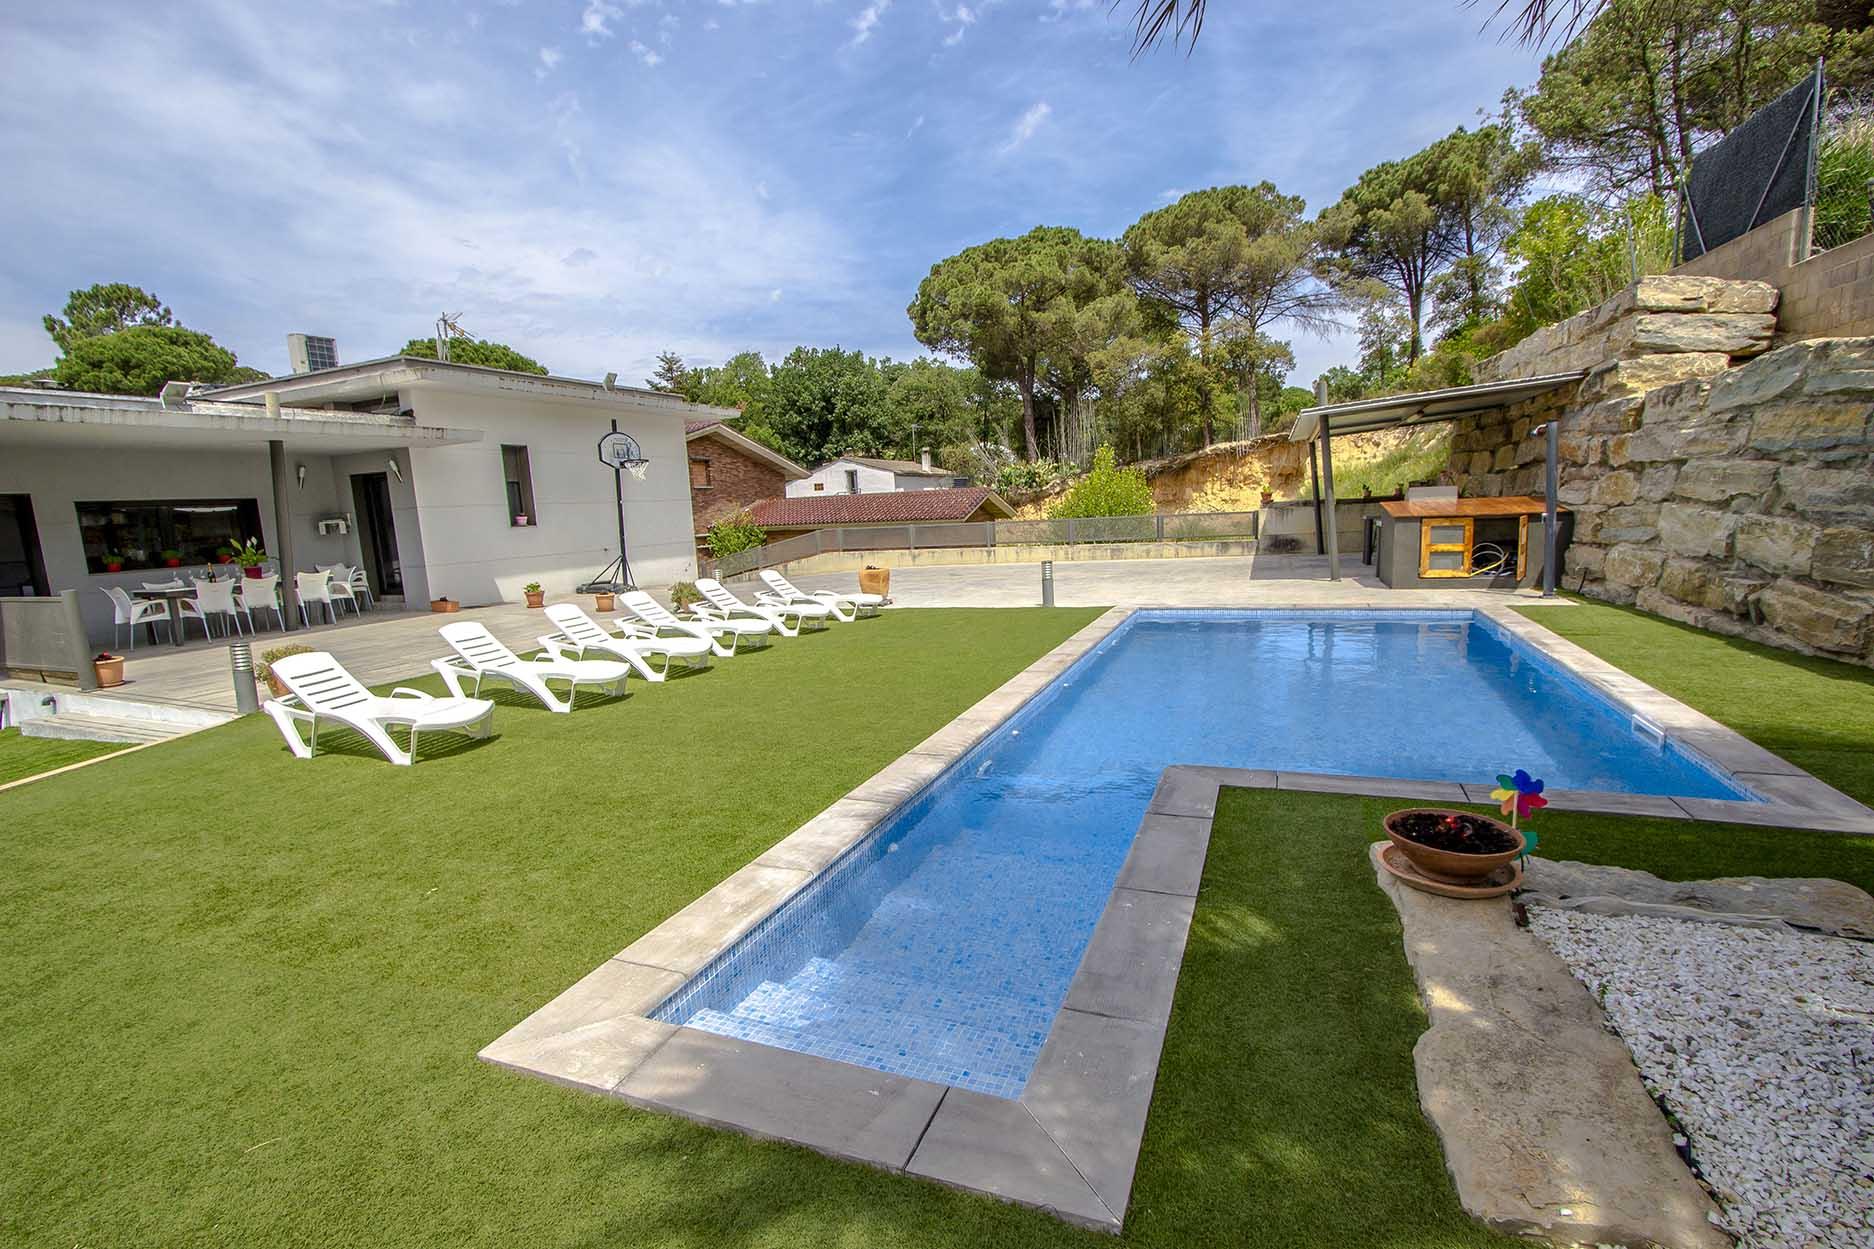 Ferienhaus Catalunya Casas: Modern villa in Sils, 15 min drive to Costa Brava beaches! (1902227), Les Mallorquines, Girona, Katalonien, Spanien, Bild 6